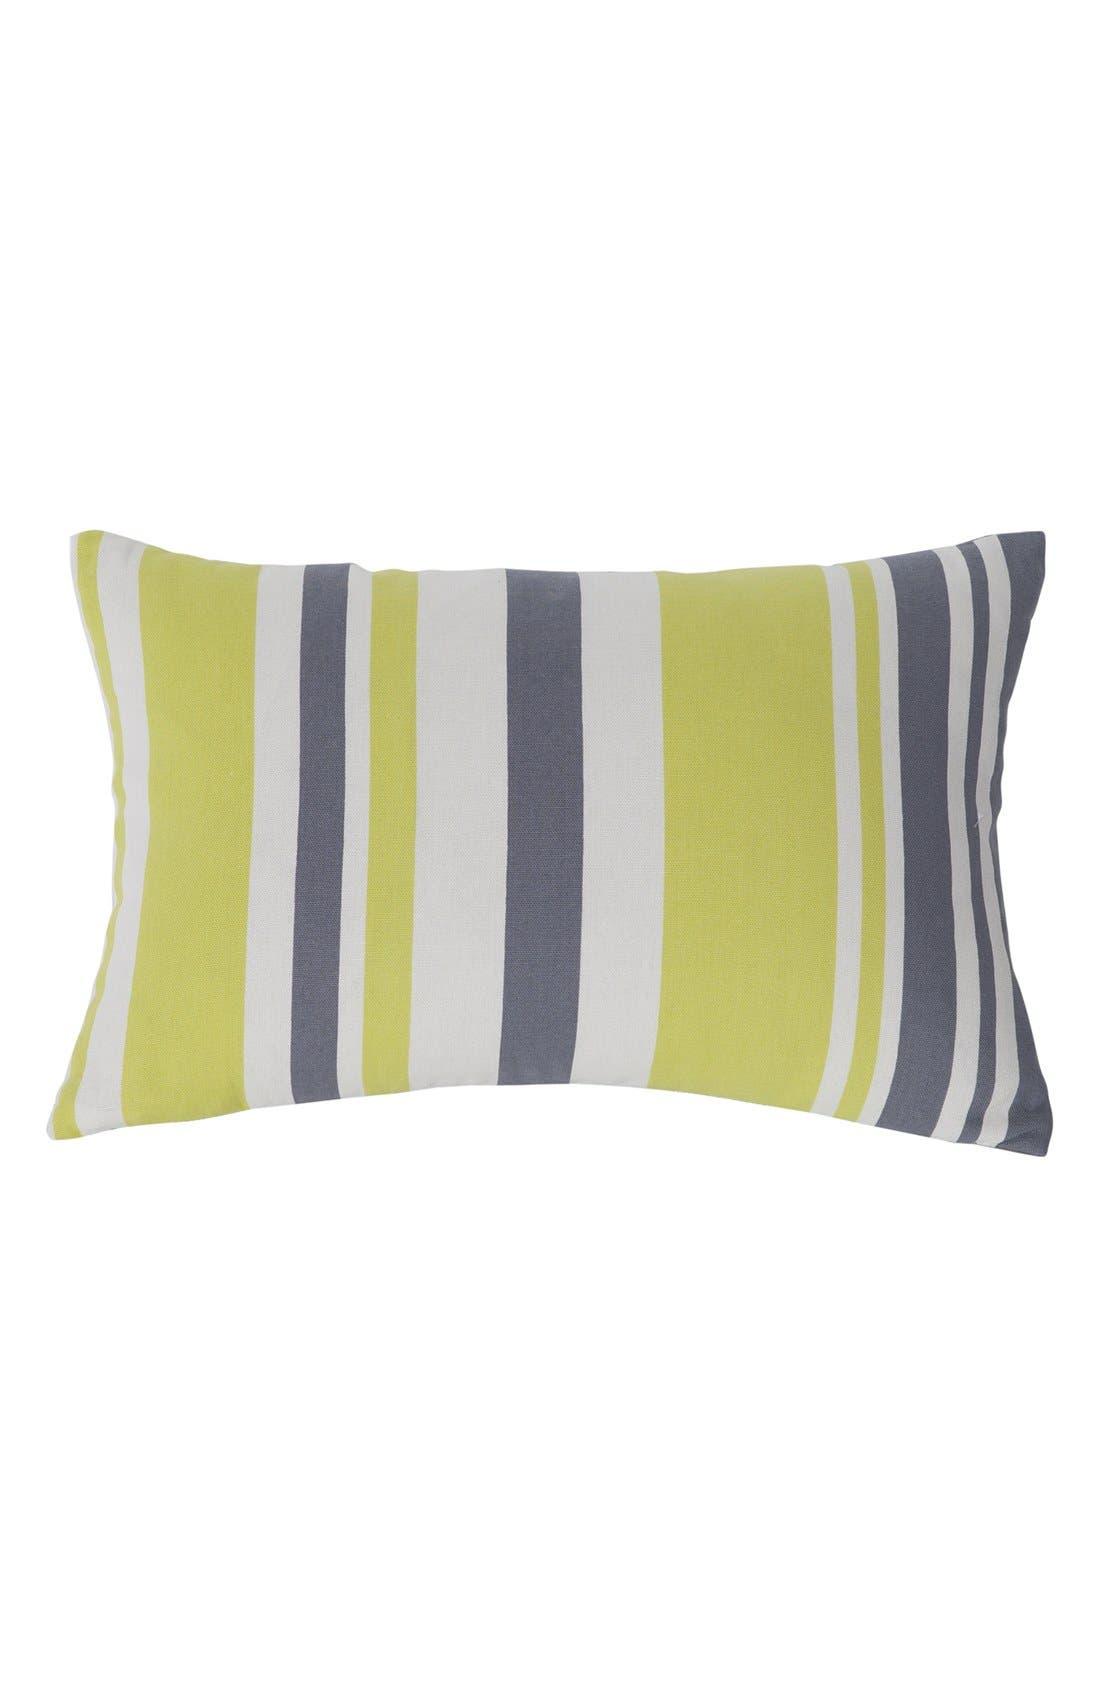 'Etta' Pillow,                             Main thumbnail 1, color,                             100